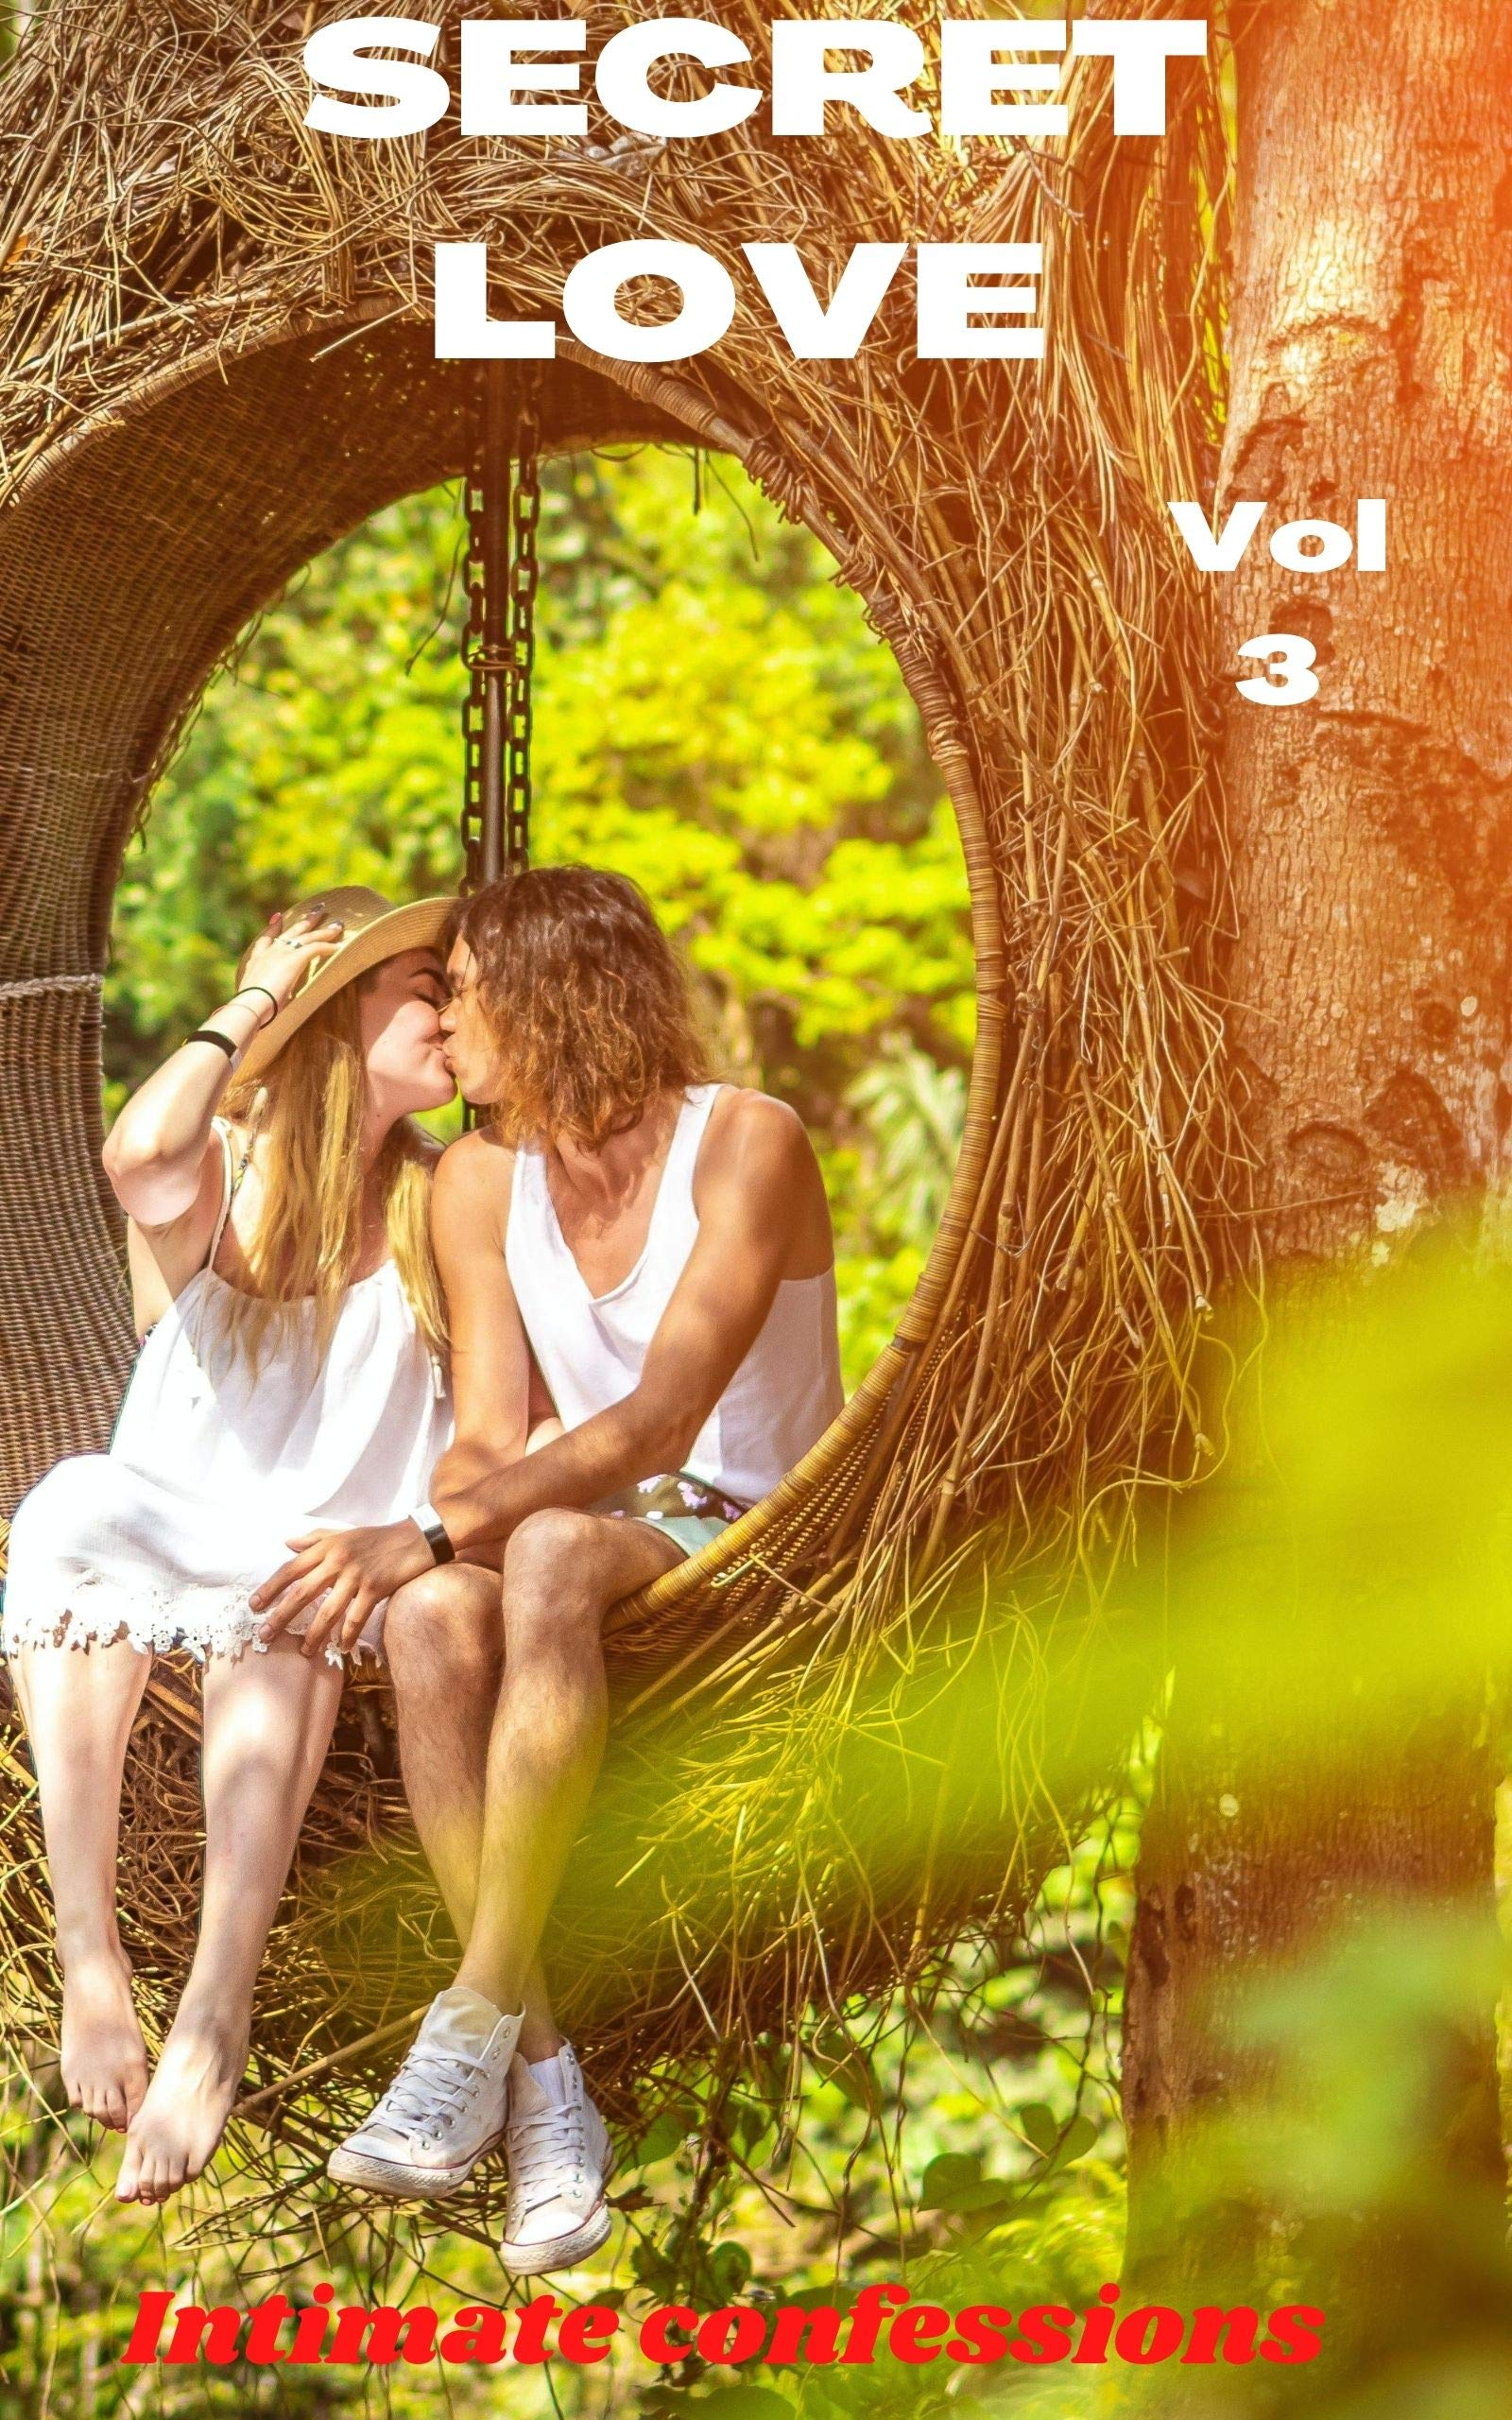 Secret love (vol 3): Intimate confessions, adult sex, erotic stories, love, fantasy, diary